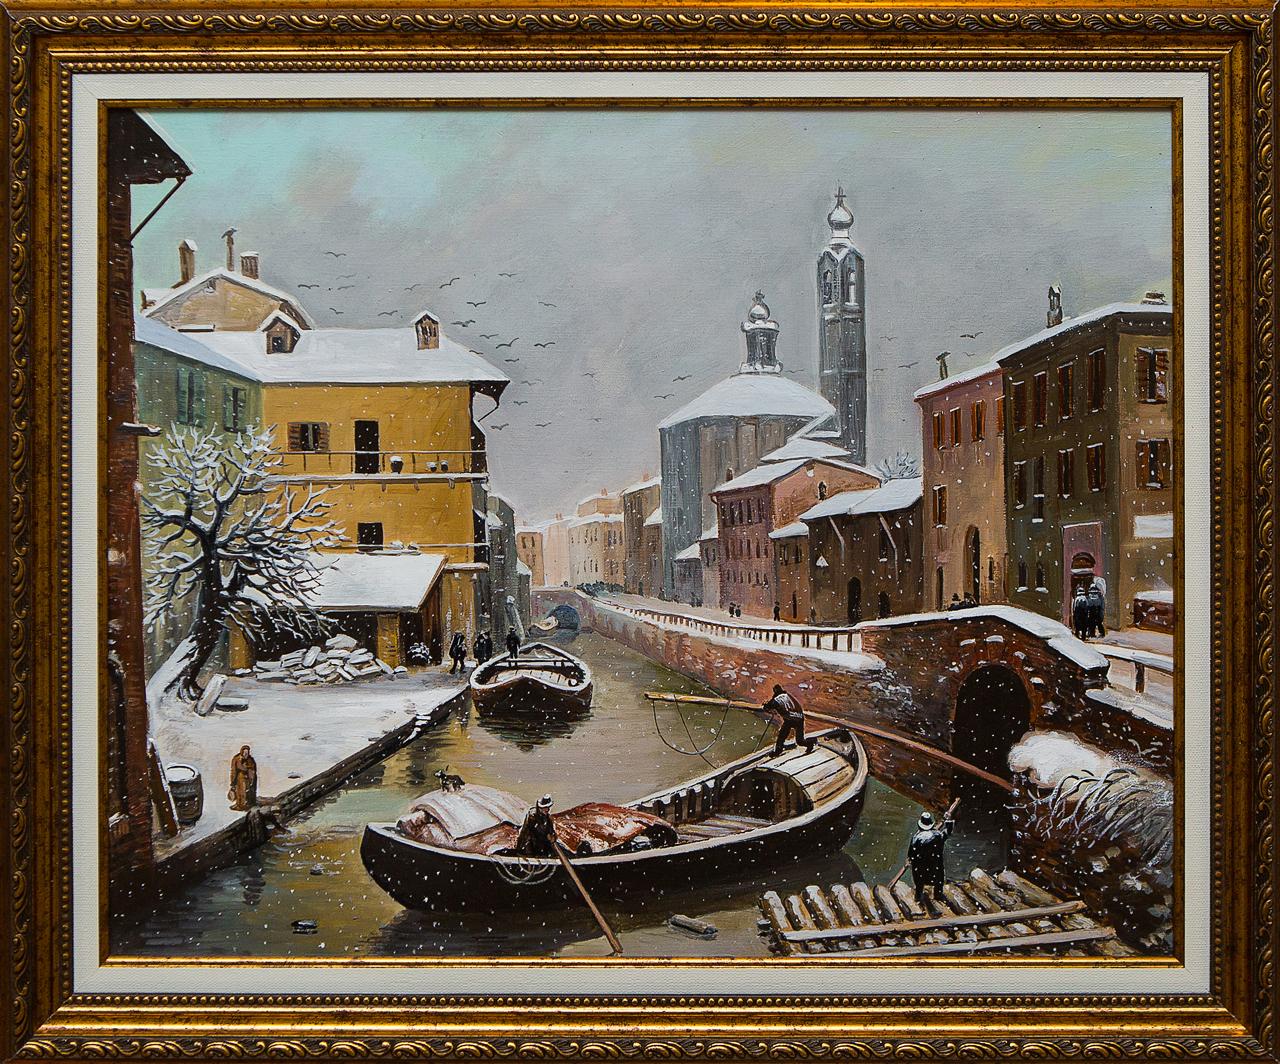 Картина маслом Барка под снегом Воробьёв картина маслом гуляки воробьёв